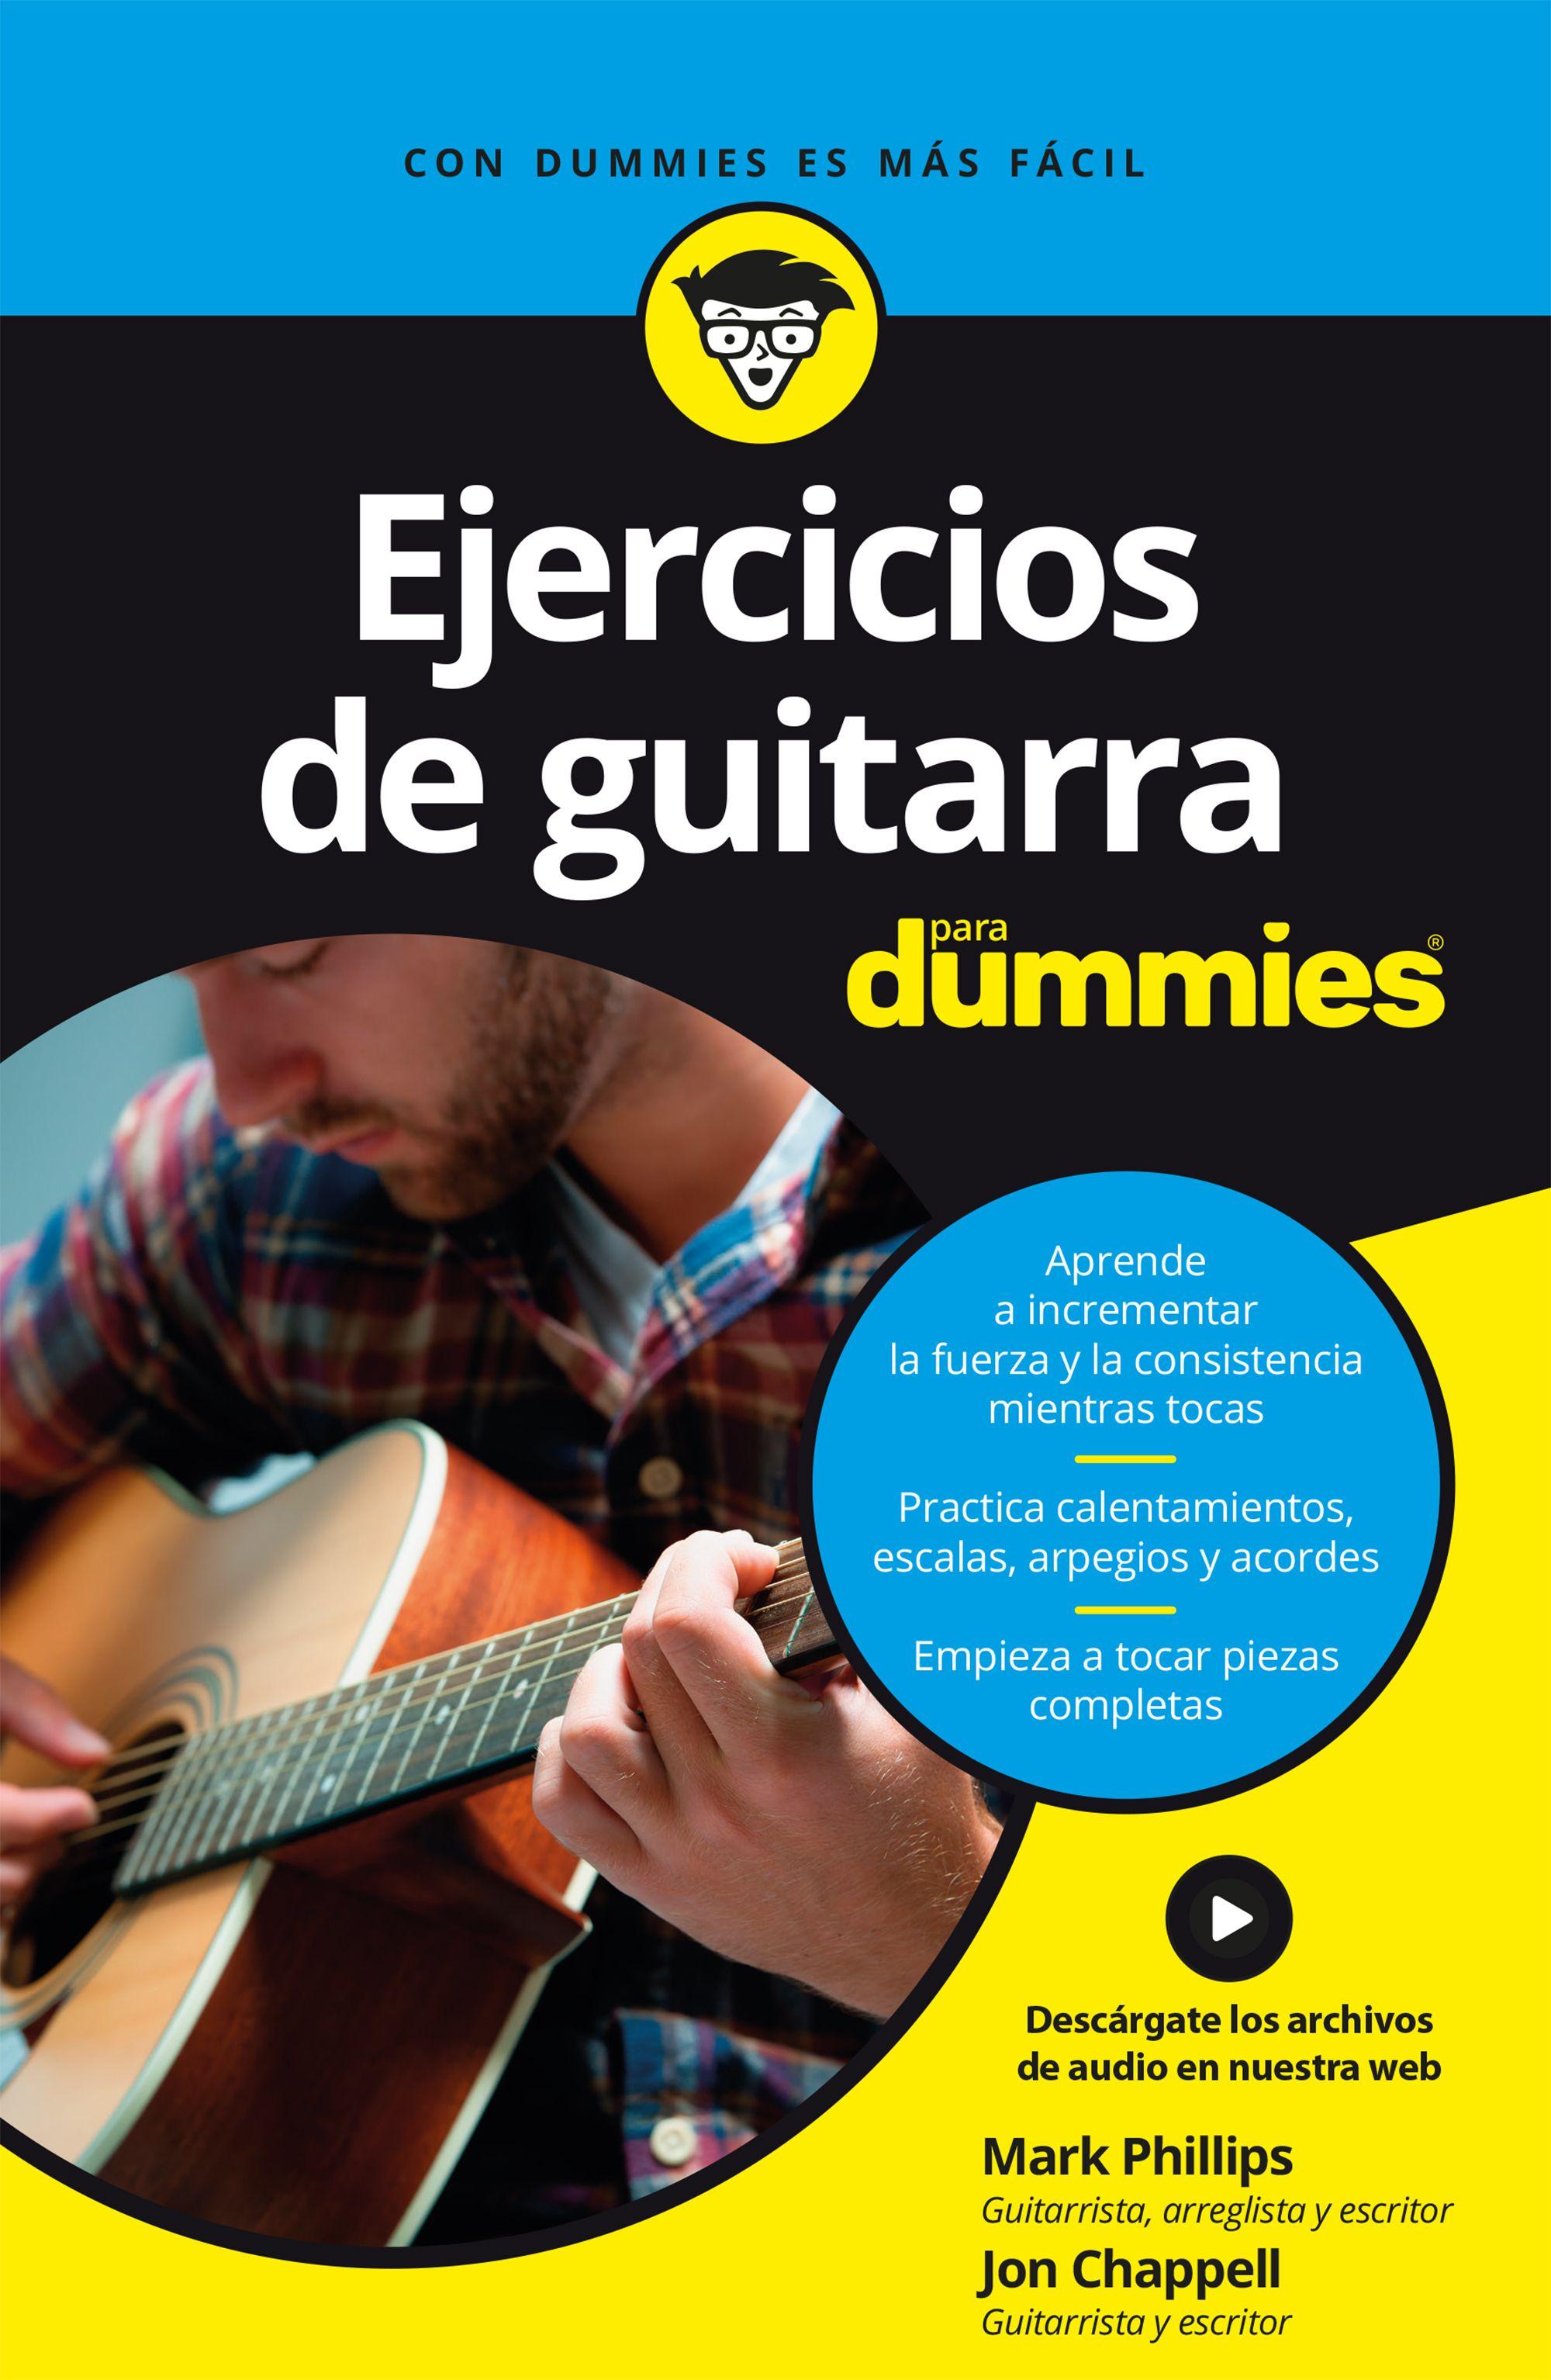 ejercicios de guitarra para dummies-mark phillips-jon chappell-9788432904684